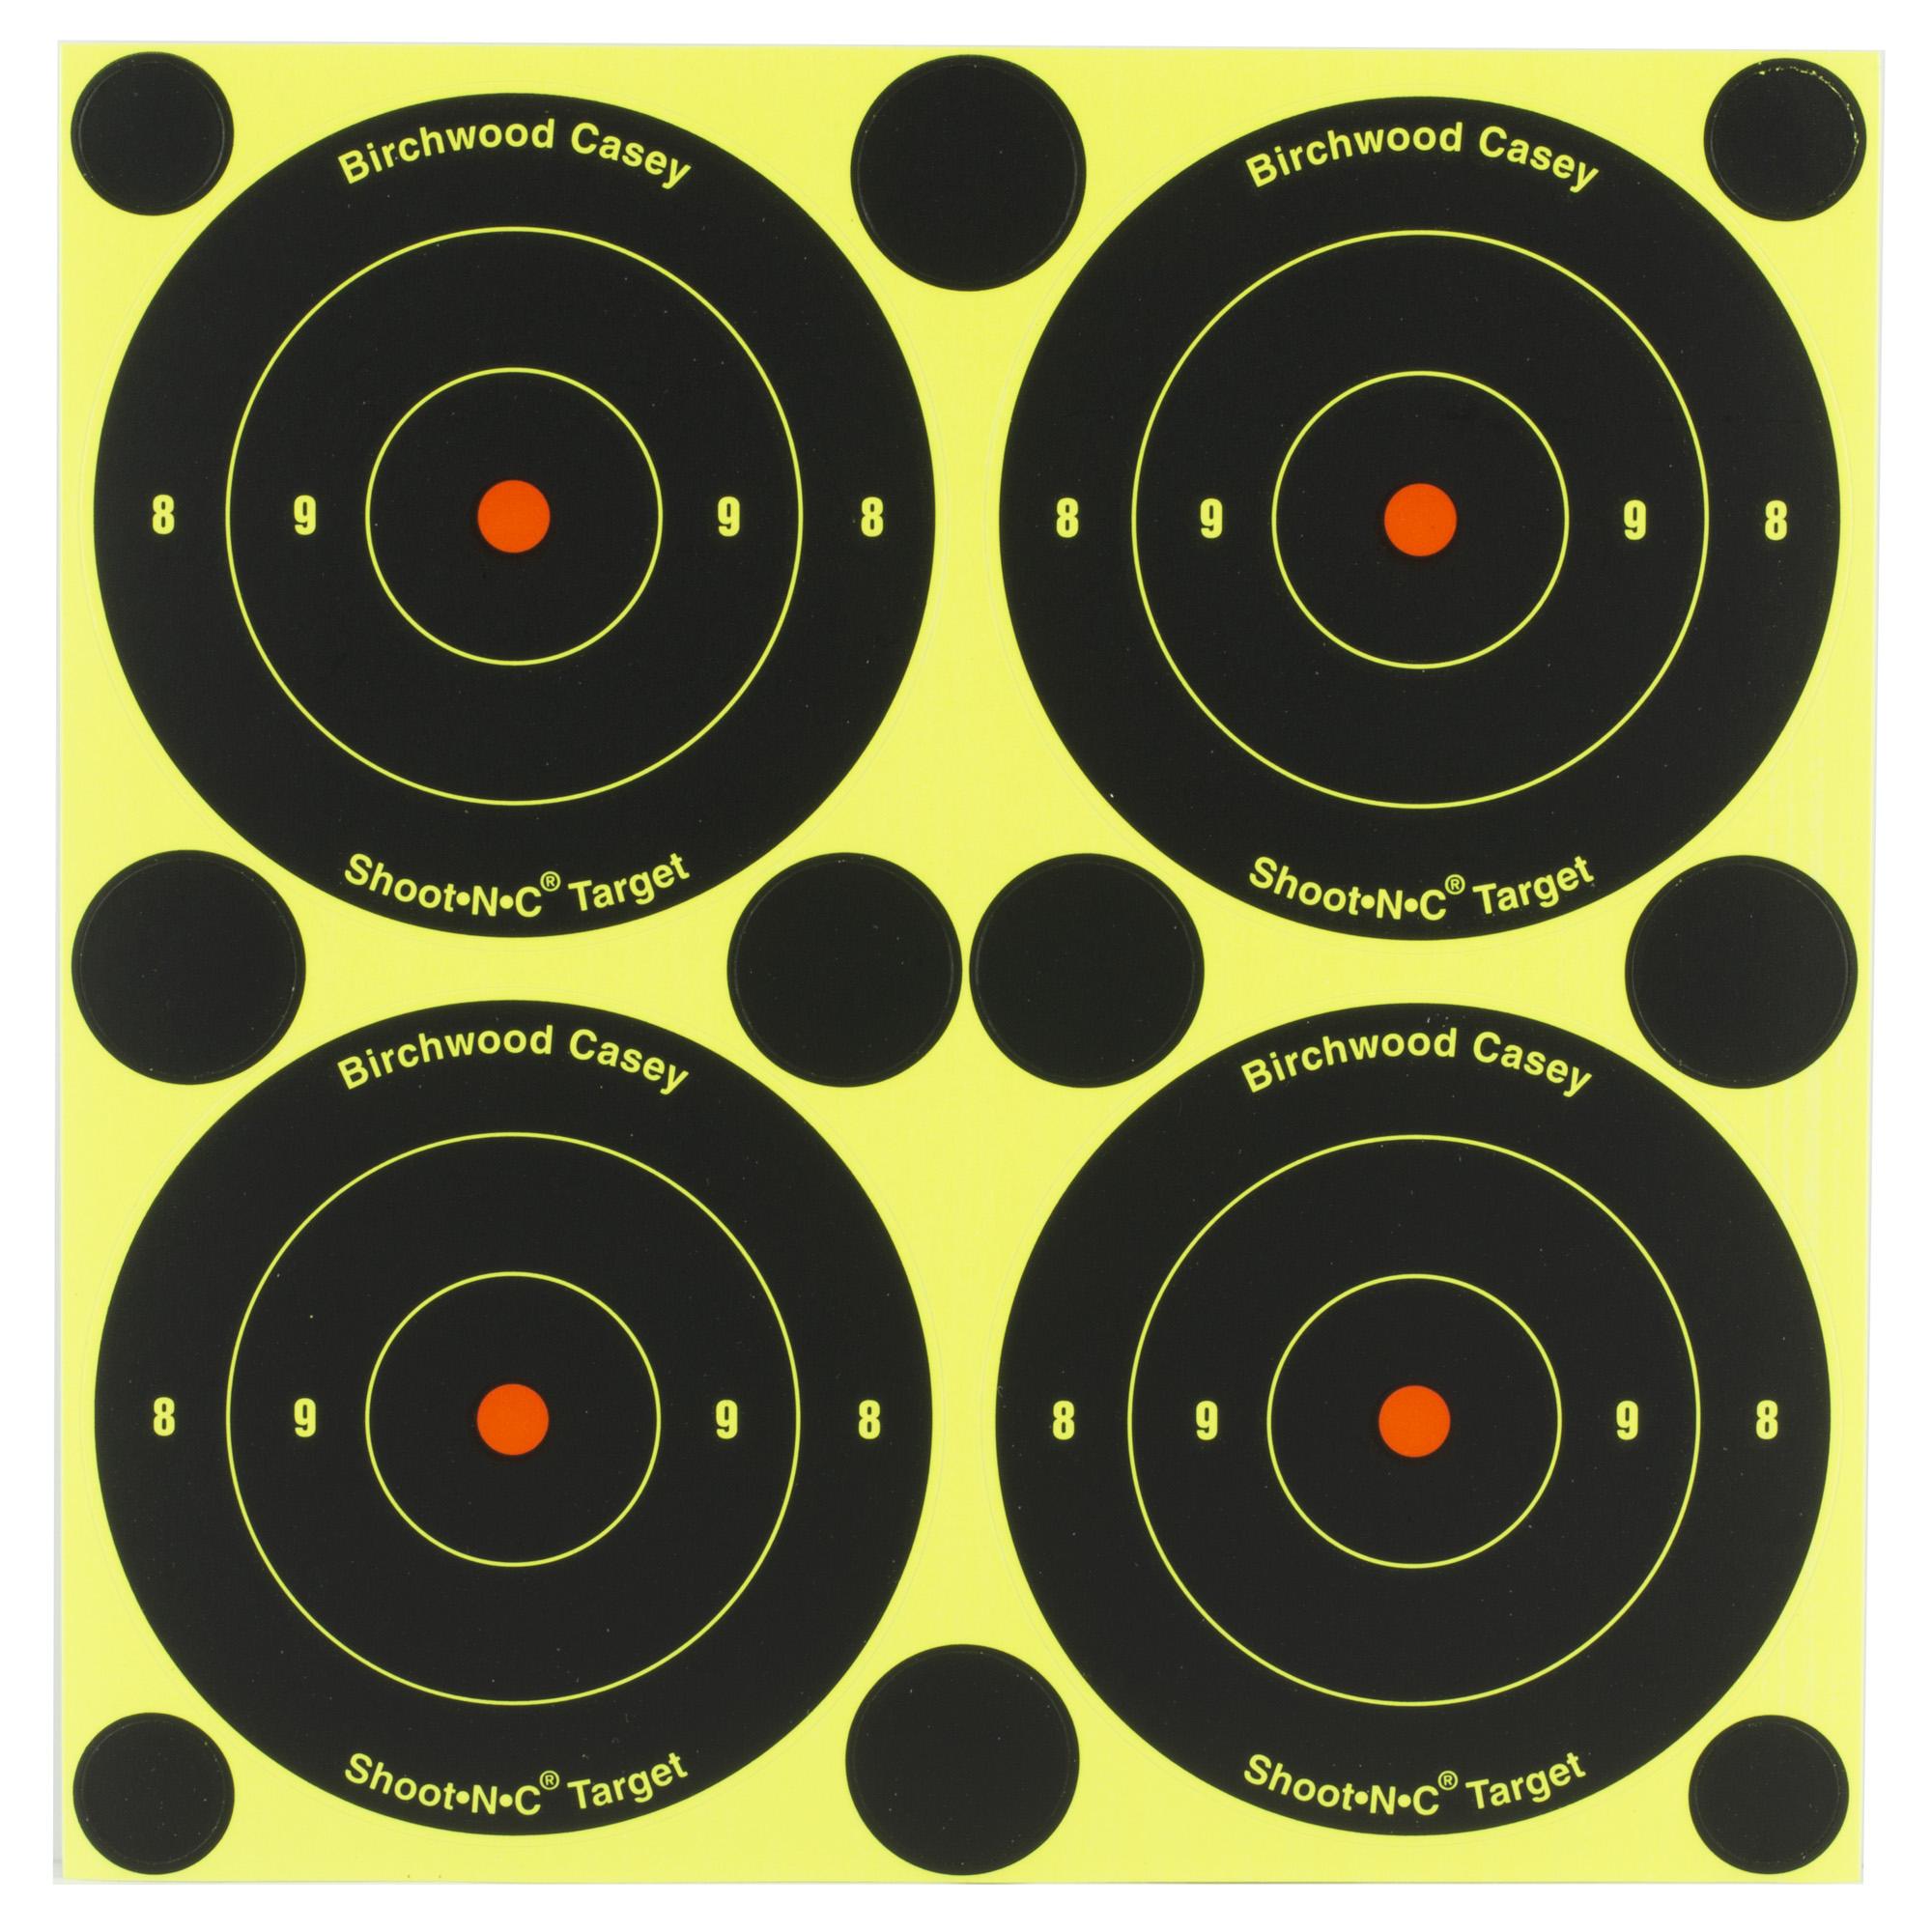 "B/c Sht-n-c Rnd Bullseye Tgt 240-3"""